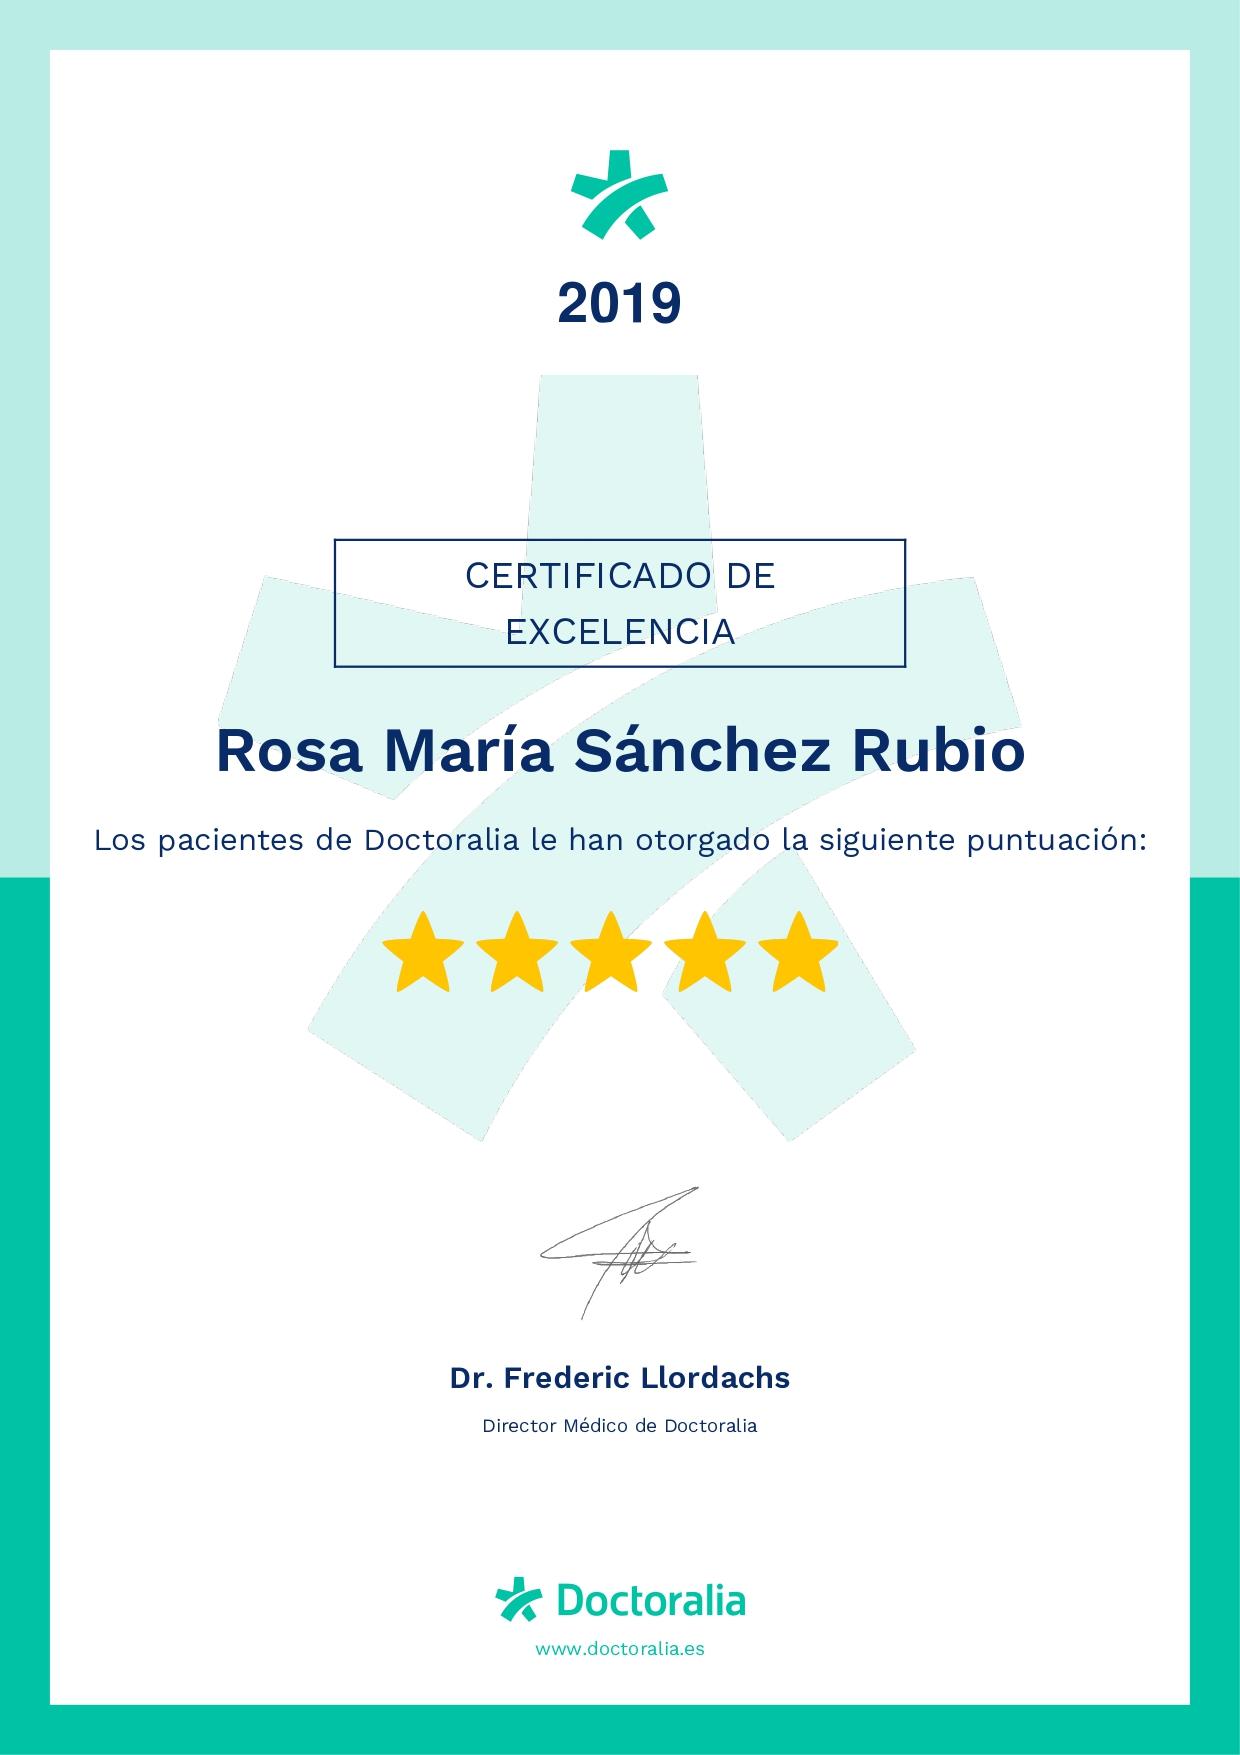 Certificado de excelencia 2019